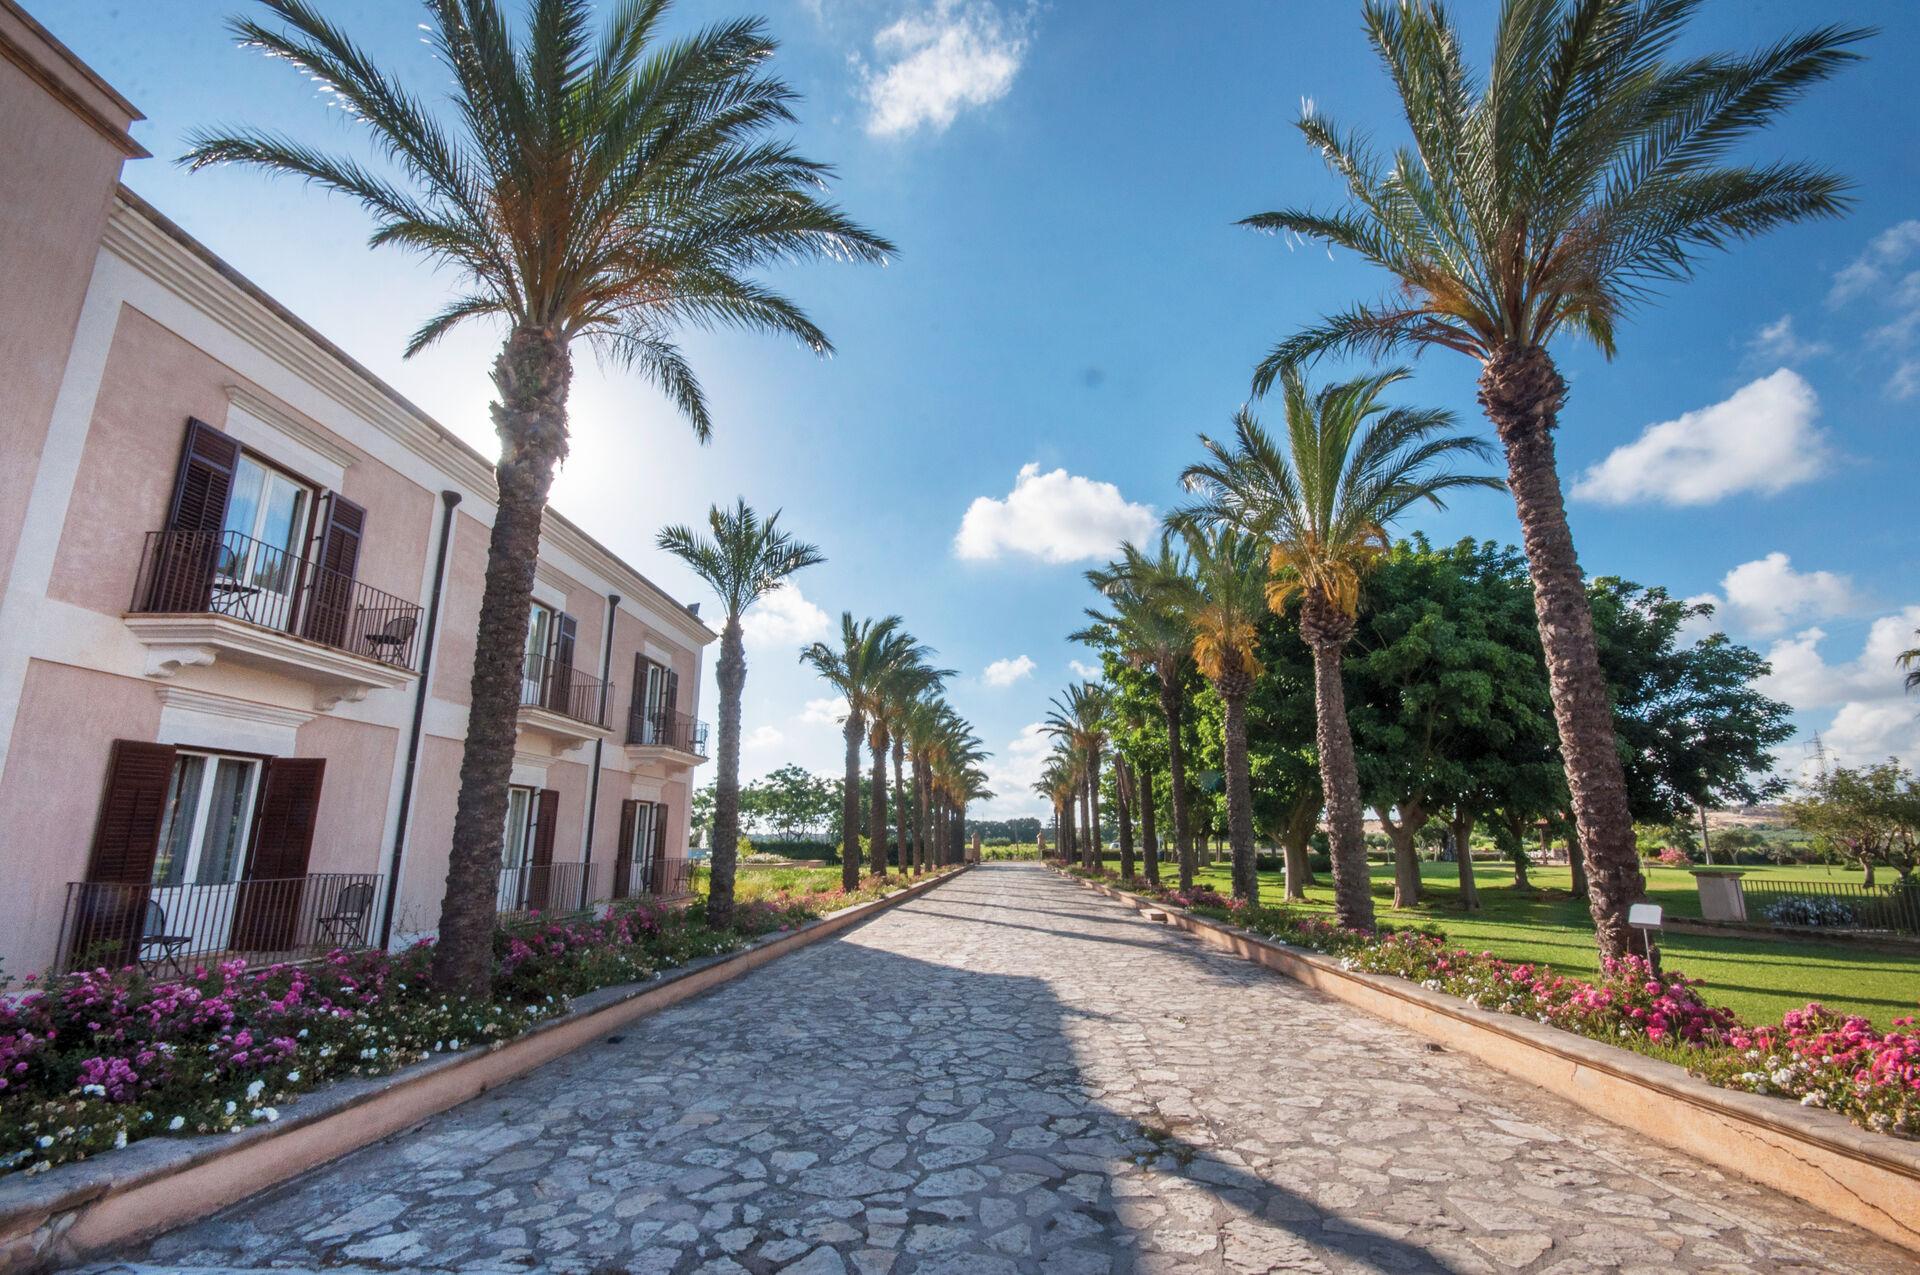 Giardino di Costanza Resort - 5*